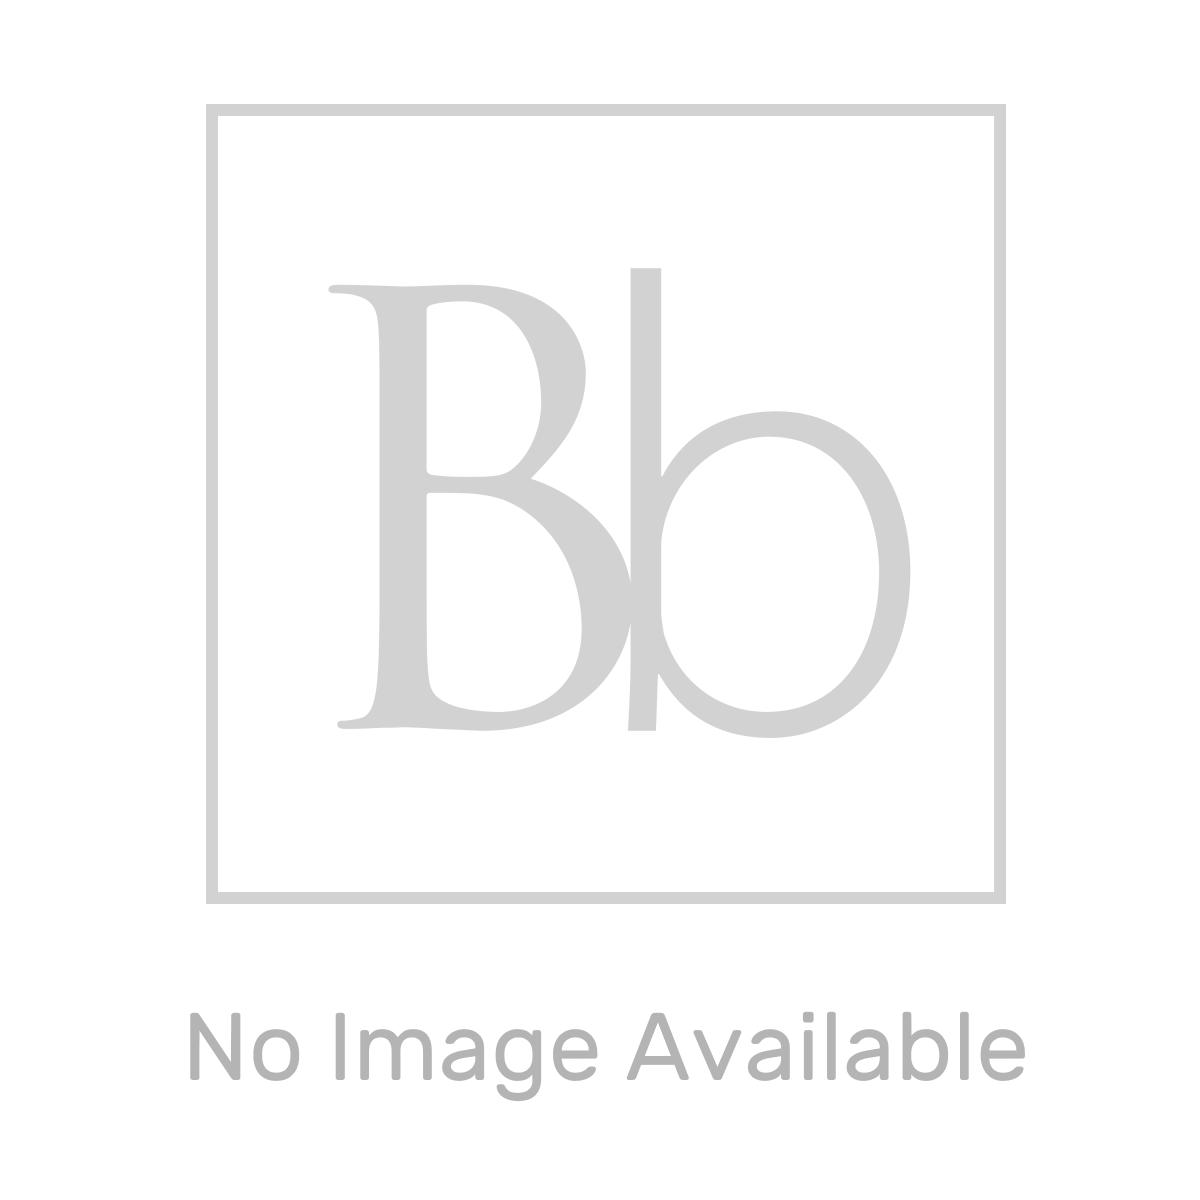 BTL Tilia Rimless Wall Mounted Toilet Line Drawing